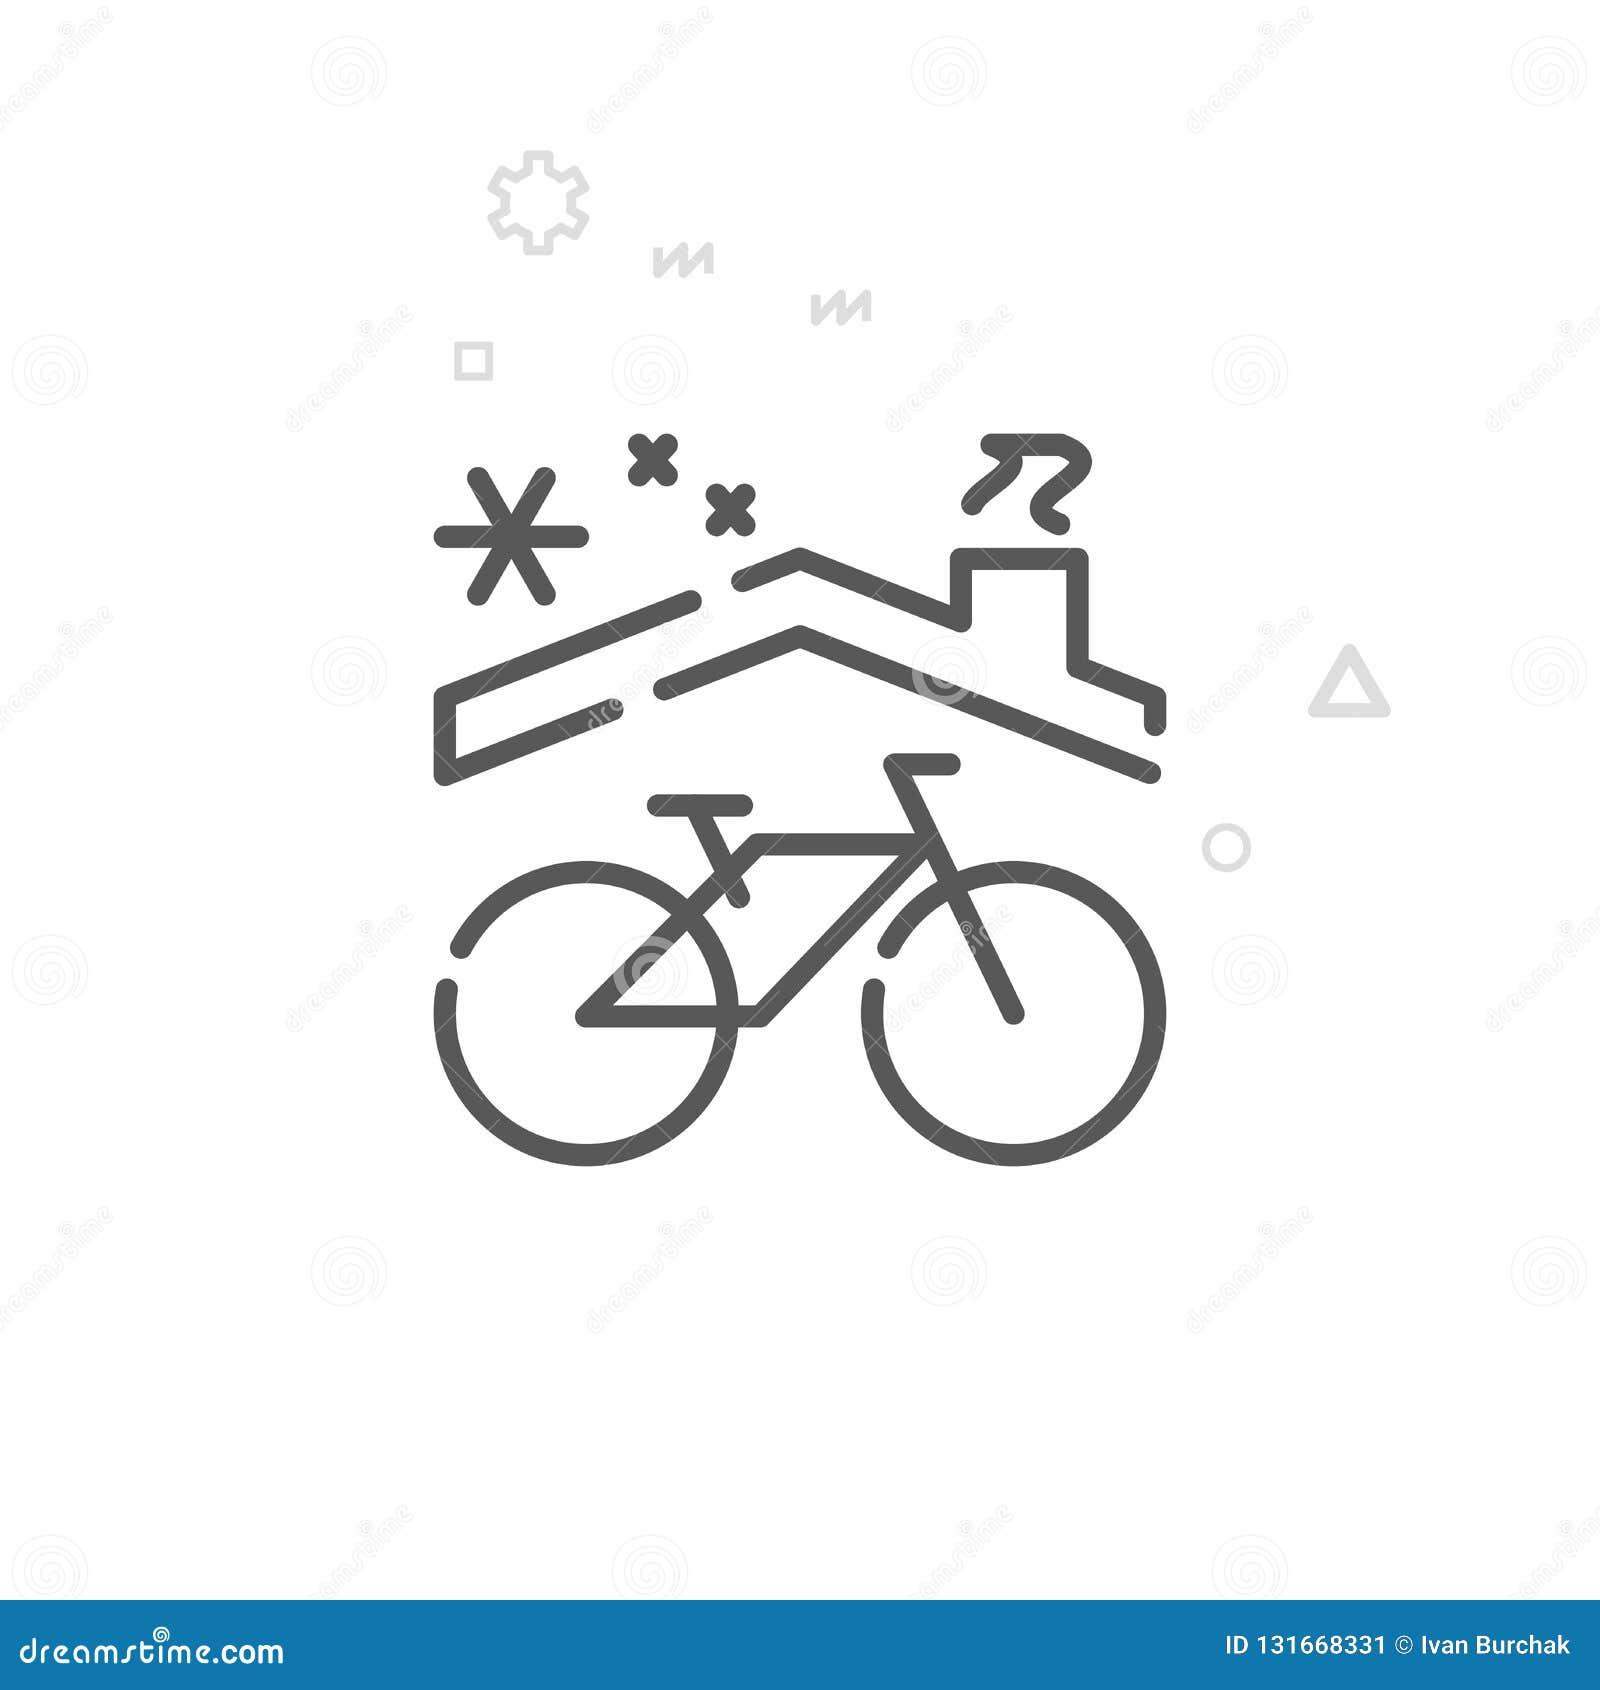 Bike Winter Storage Vector Line Icon, Symbol, Pictogram, Sign. Light Abstract Geometric Background. Editable Stroke